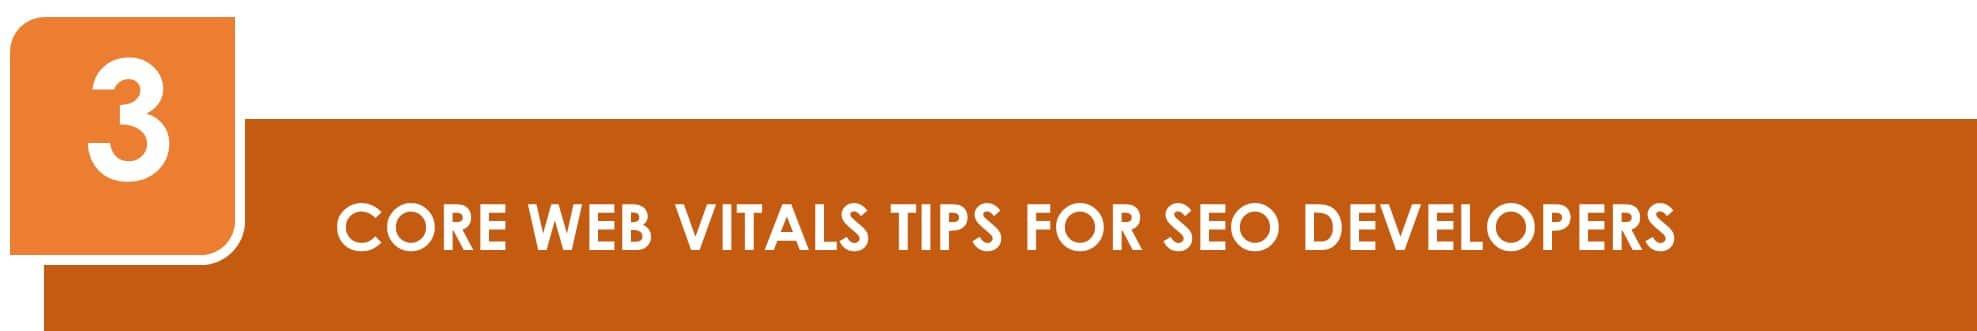 Core Web Vitals Tips for SEO Developers